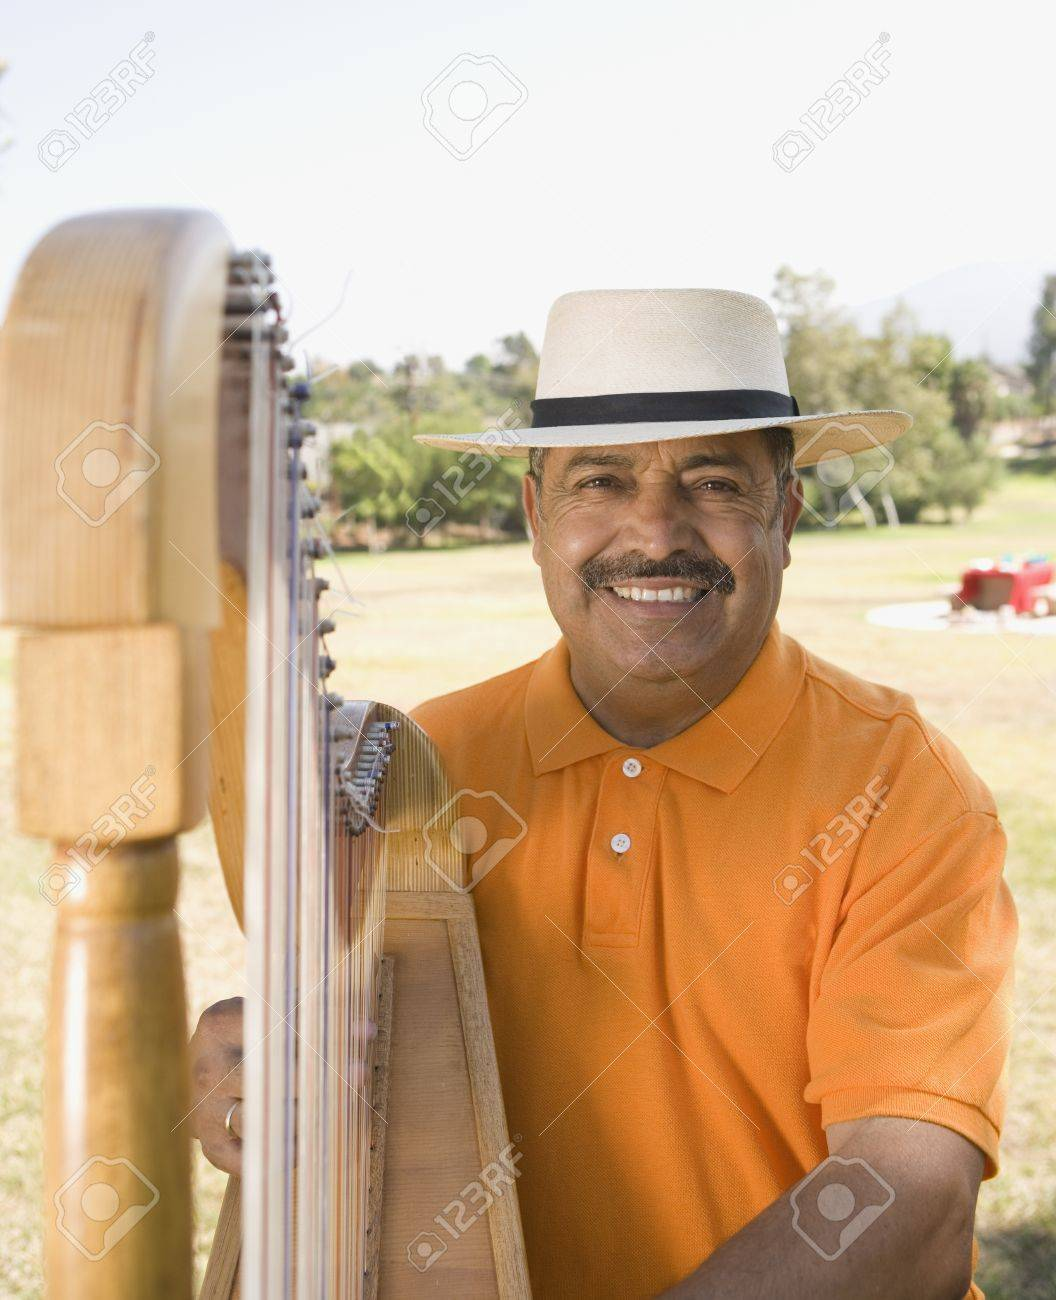 Middle-aged Hispanic man playing harp outdoors Stock Photo - 16092745